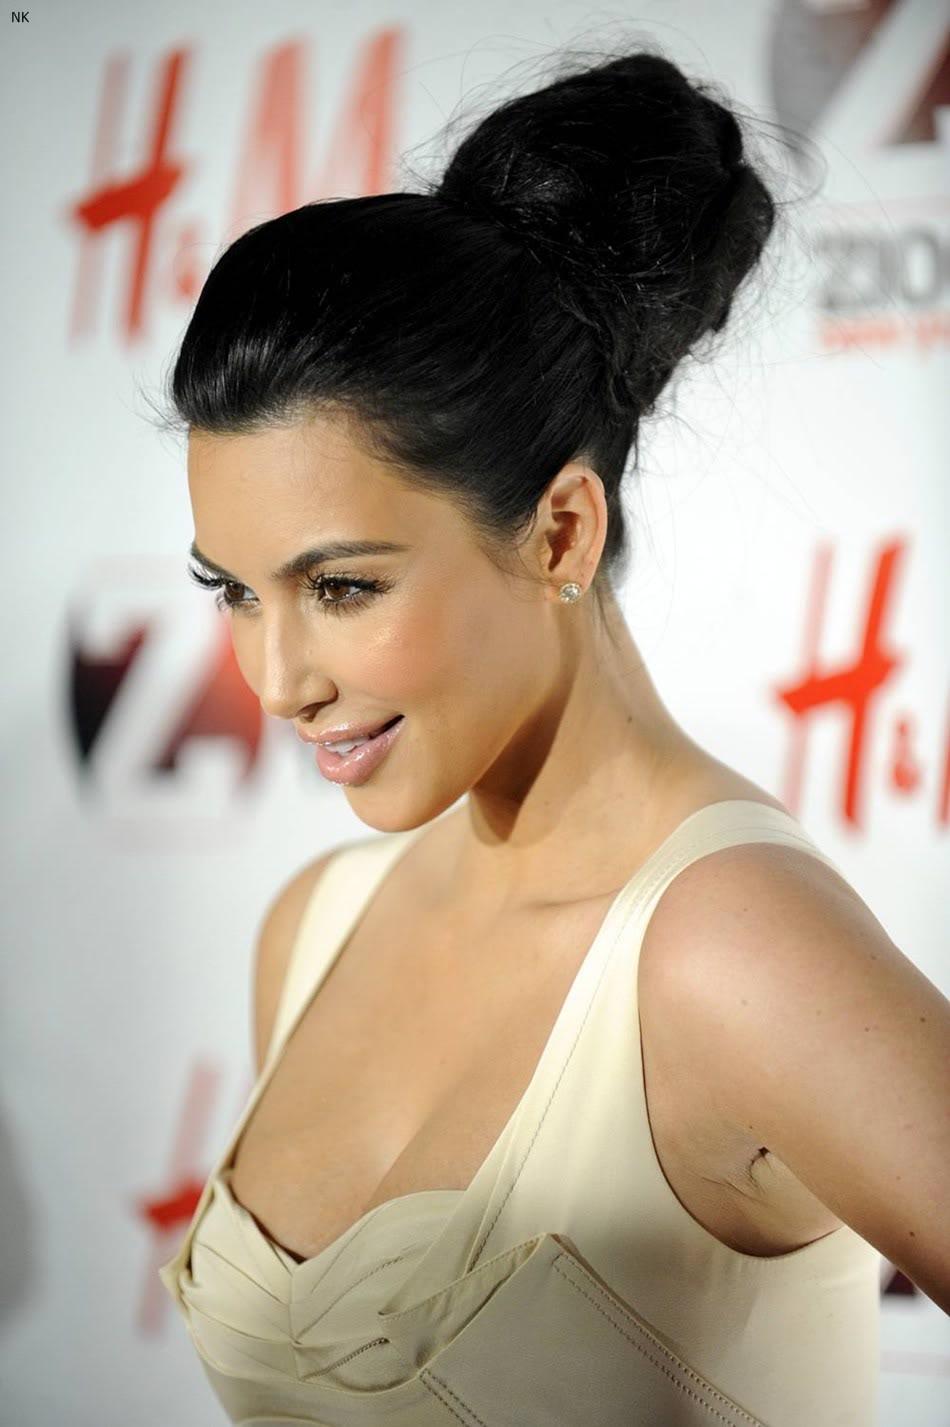 http://4.bp.blogspot.com/-PXkPVuOExY0/TbS4-qifTcI/AAAAAAAADvE/pFMb-FmMOPA/s1600/kim_kardashian_dress%2B%25288%2529.jpg